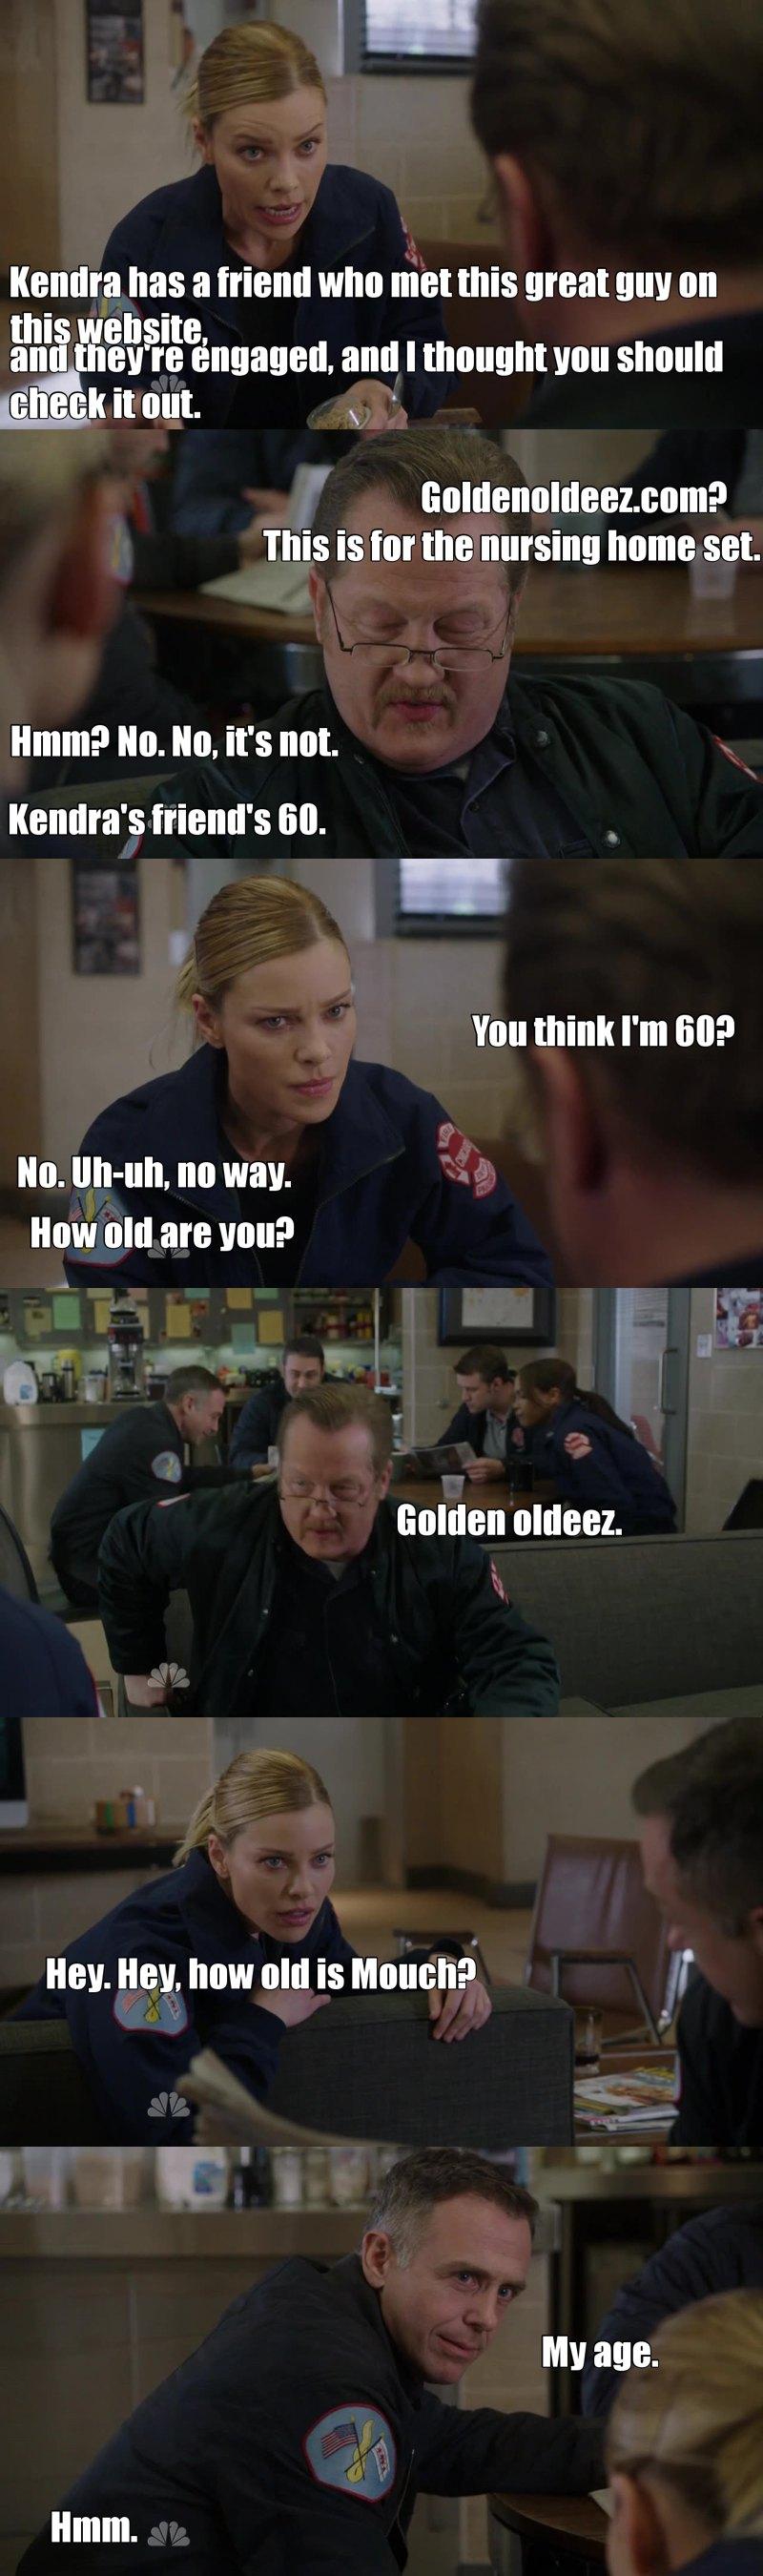 Hahaha this scene was golden